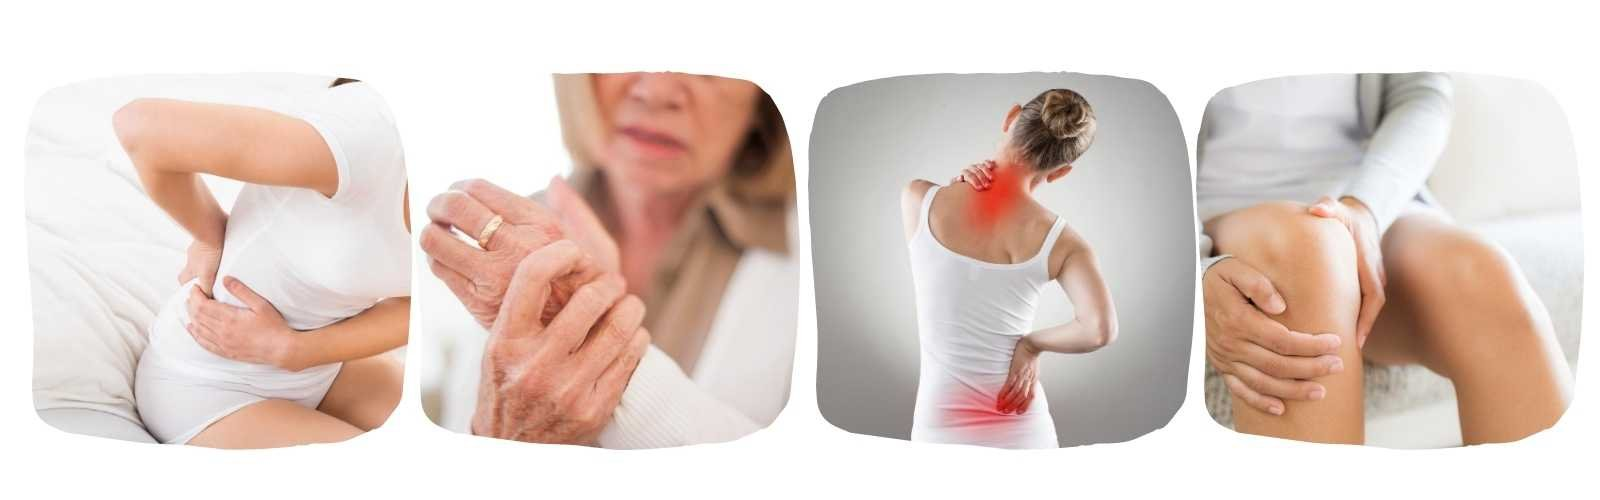 gel-sindolor-dolor-muscular